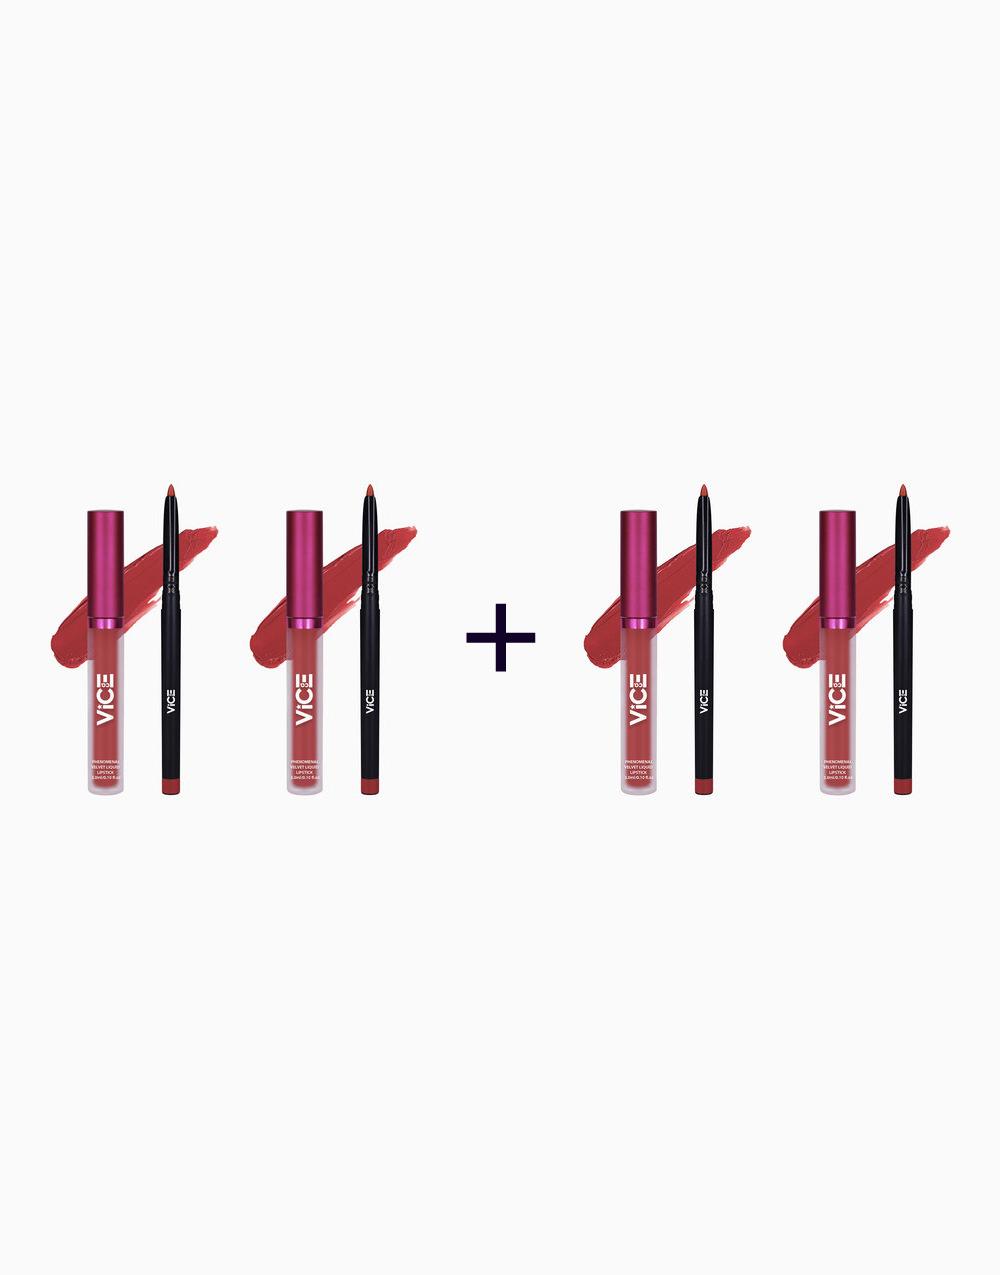 Phenomenal Velvet Lip Kit (3ml + 0.25g) (Buy 2, Take 2) by Vice Cosmetics   Vulevu